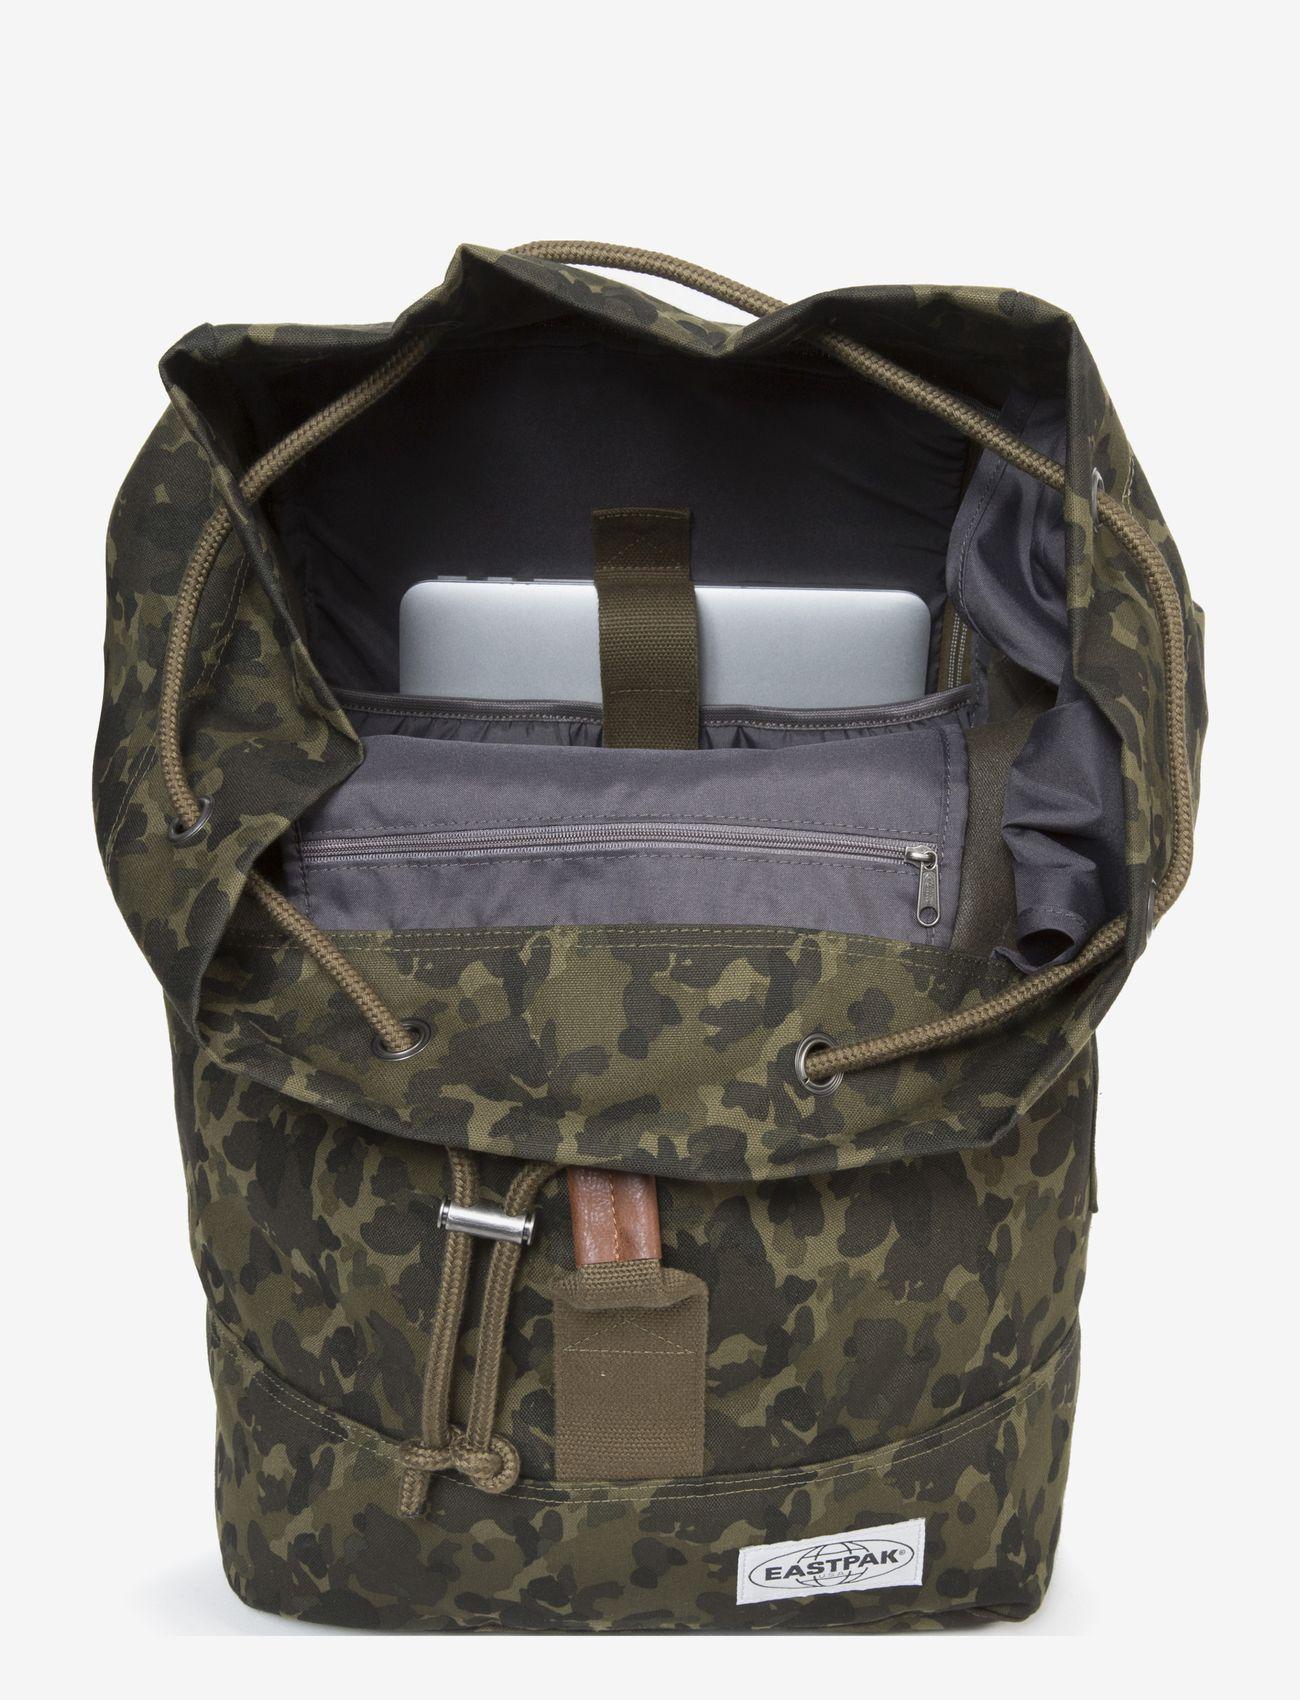 Eastpak - PLISTER - backpacks - opgrade camo - 1